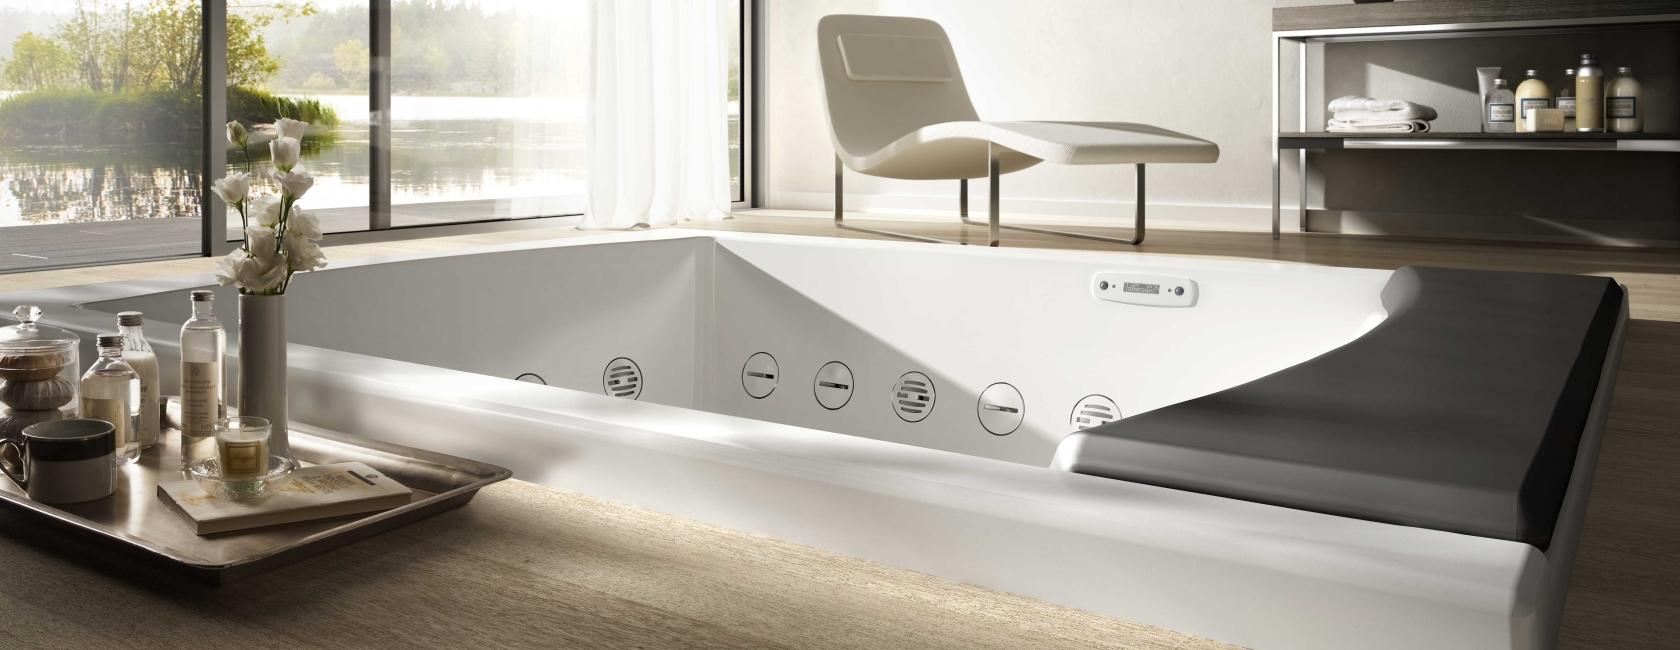 countersunk-jet-bath